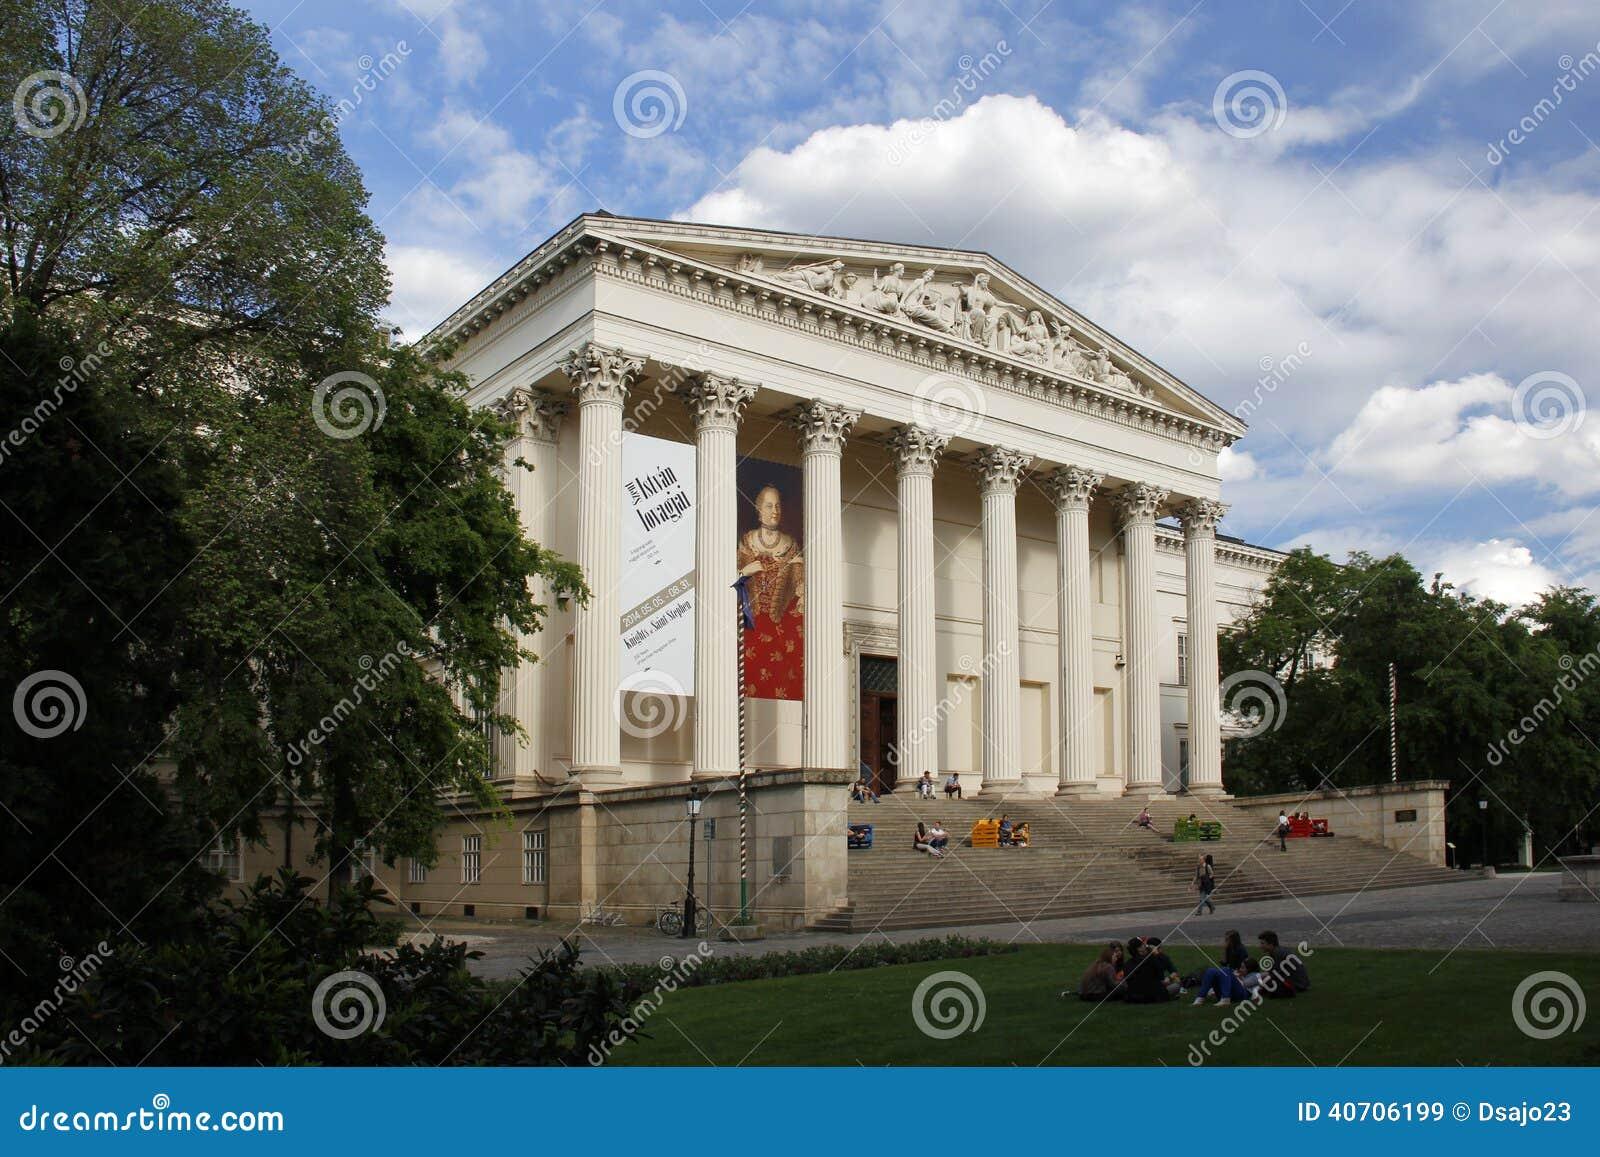 BUDAPEST/HONGRIE - 9 MAI : Musée National hongrois, le 9 mai 2014 à Budapest/en Hongrie